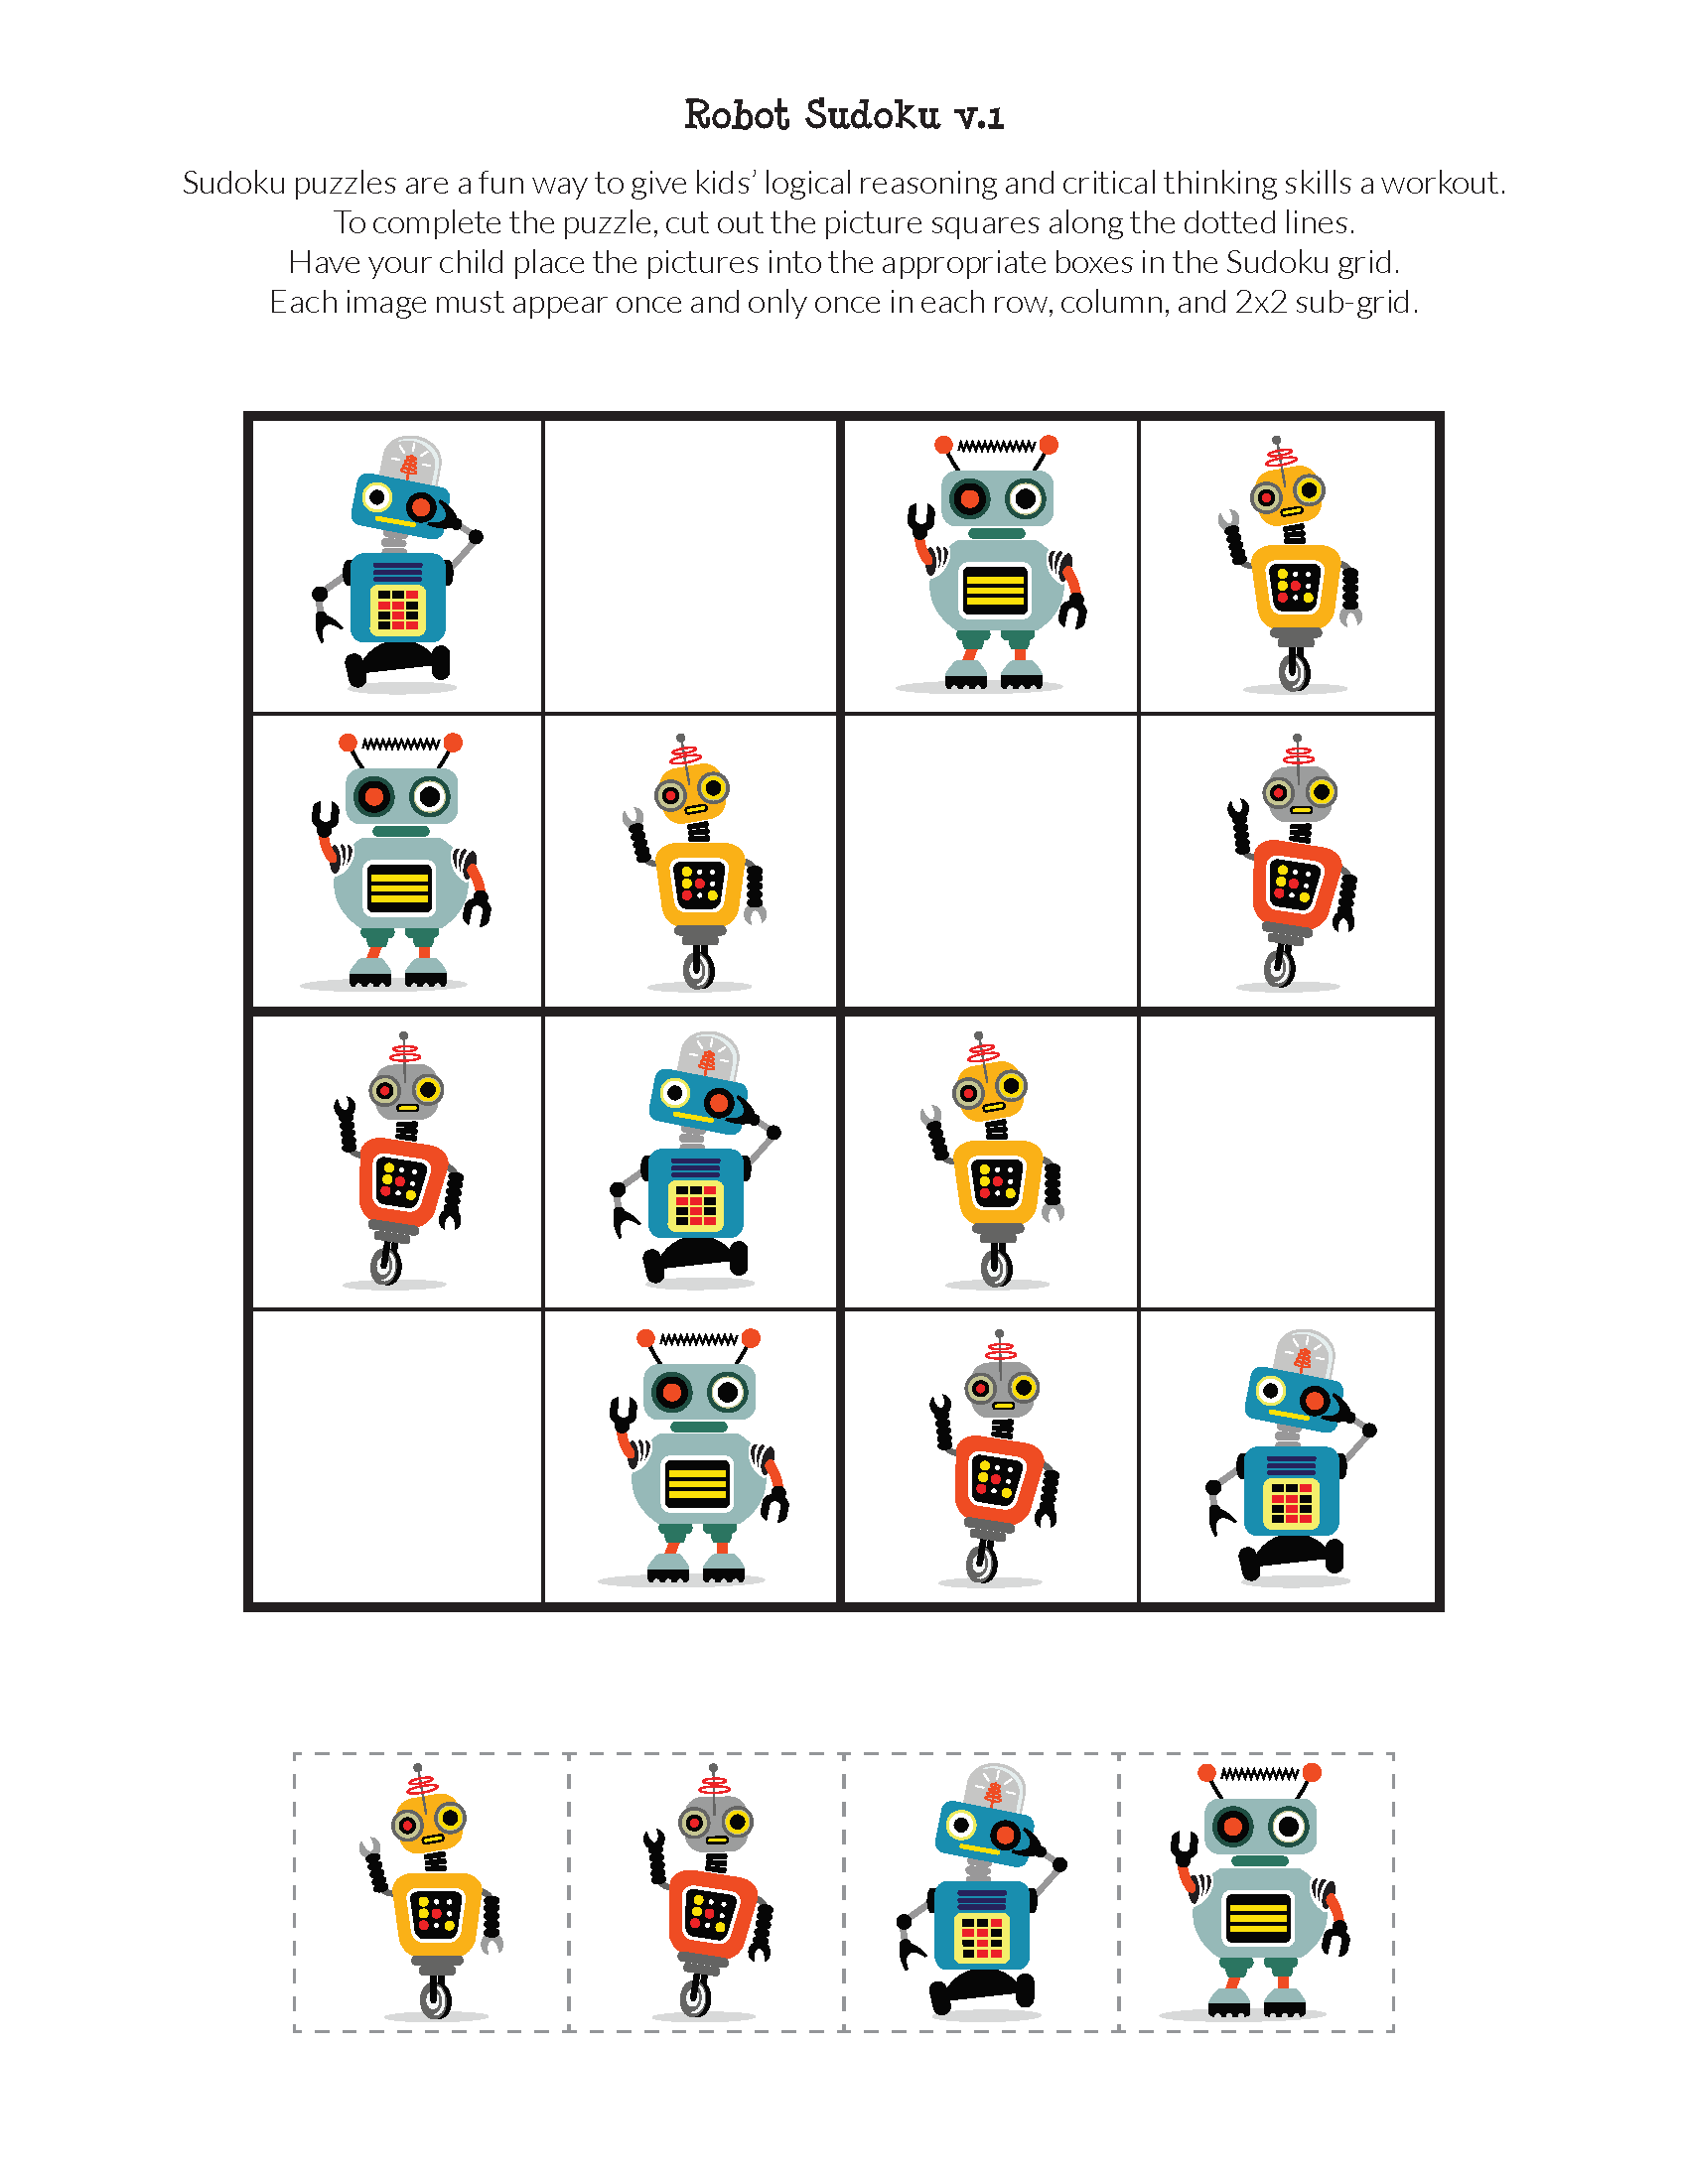 Robot Sudoku Puzzles Free Printables Sudoku Puzzles Sudoku Robot [ 2200 x 1700 Pixel ]